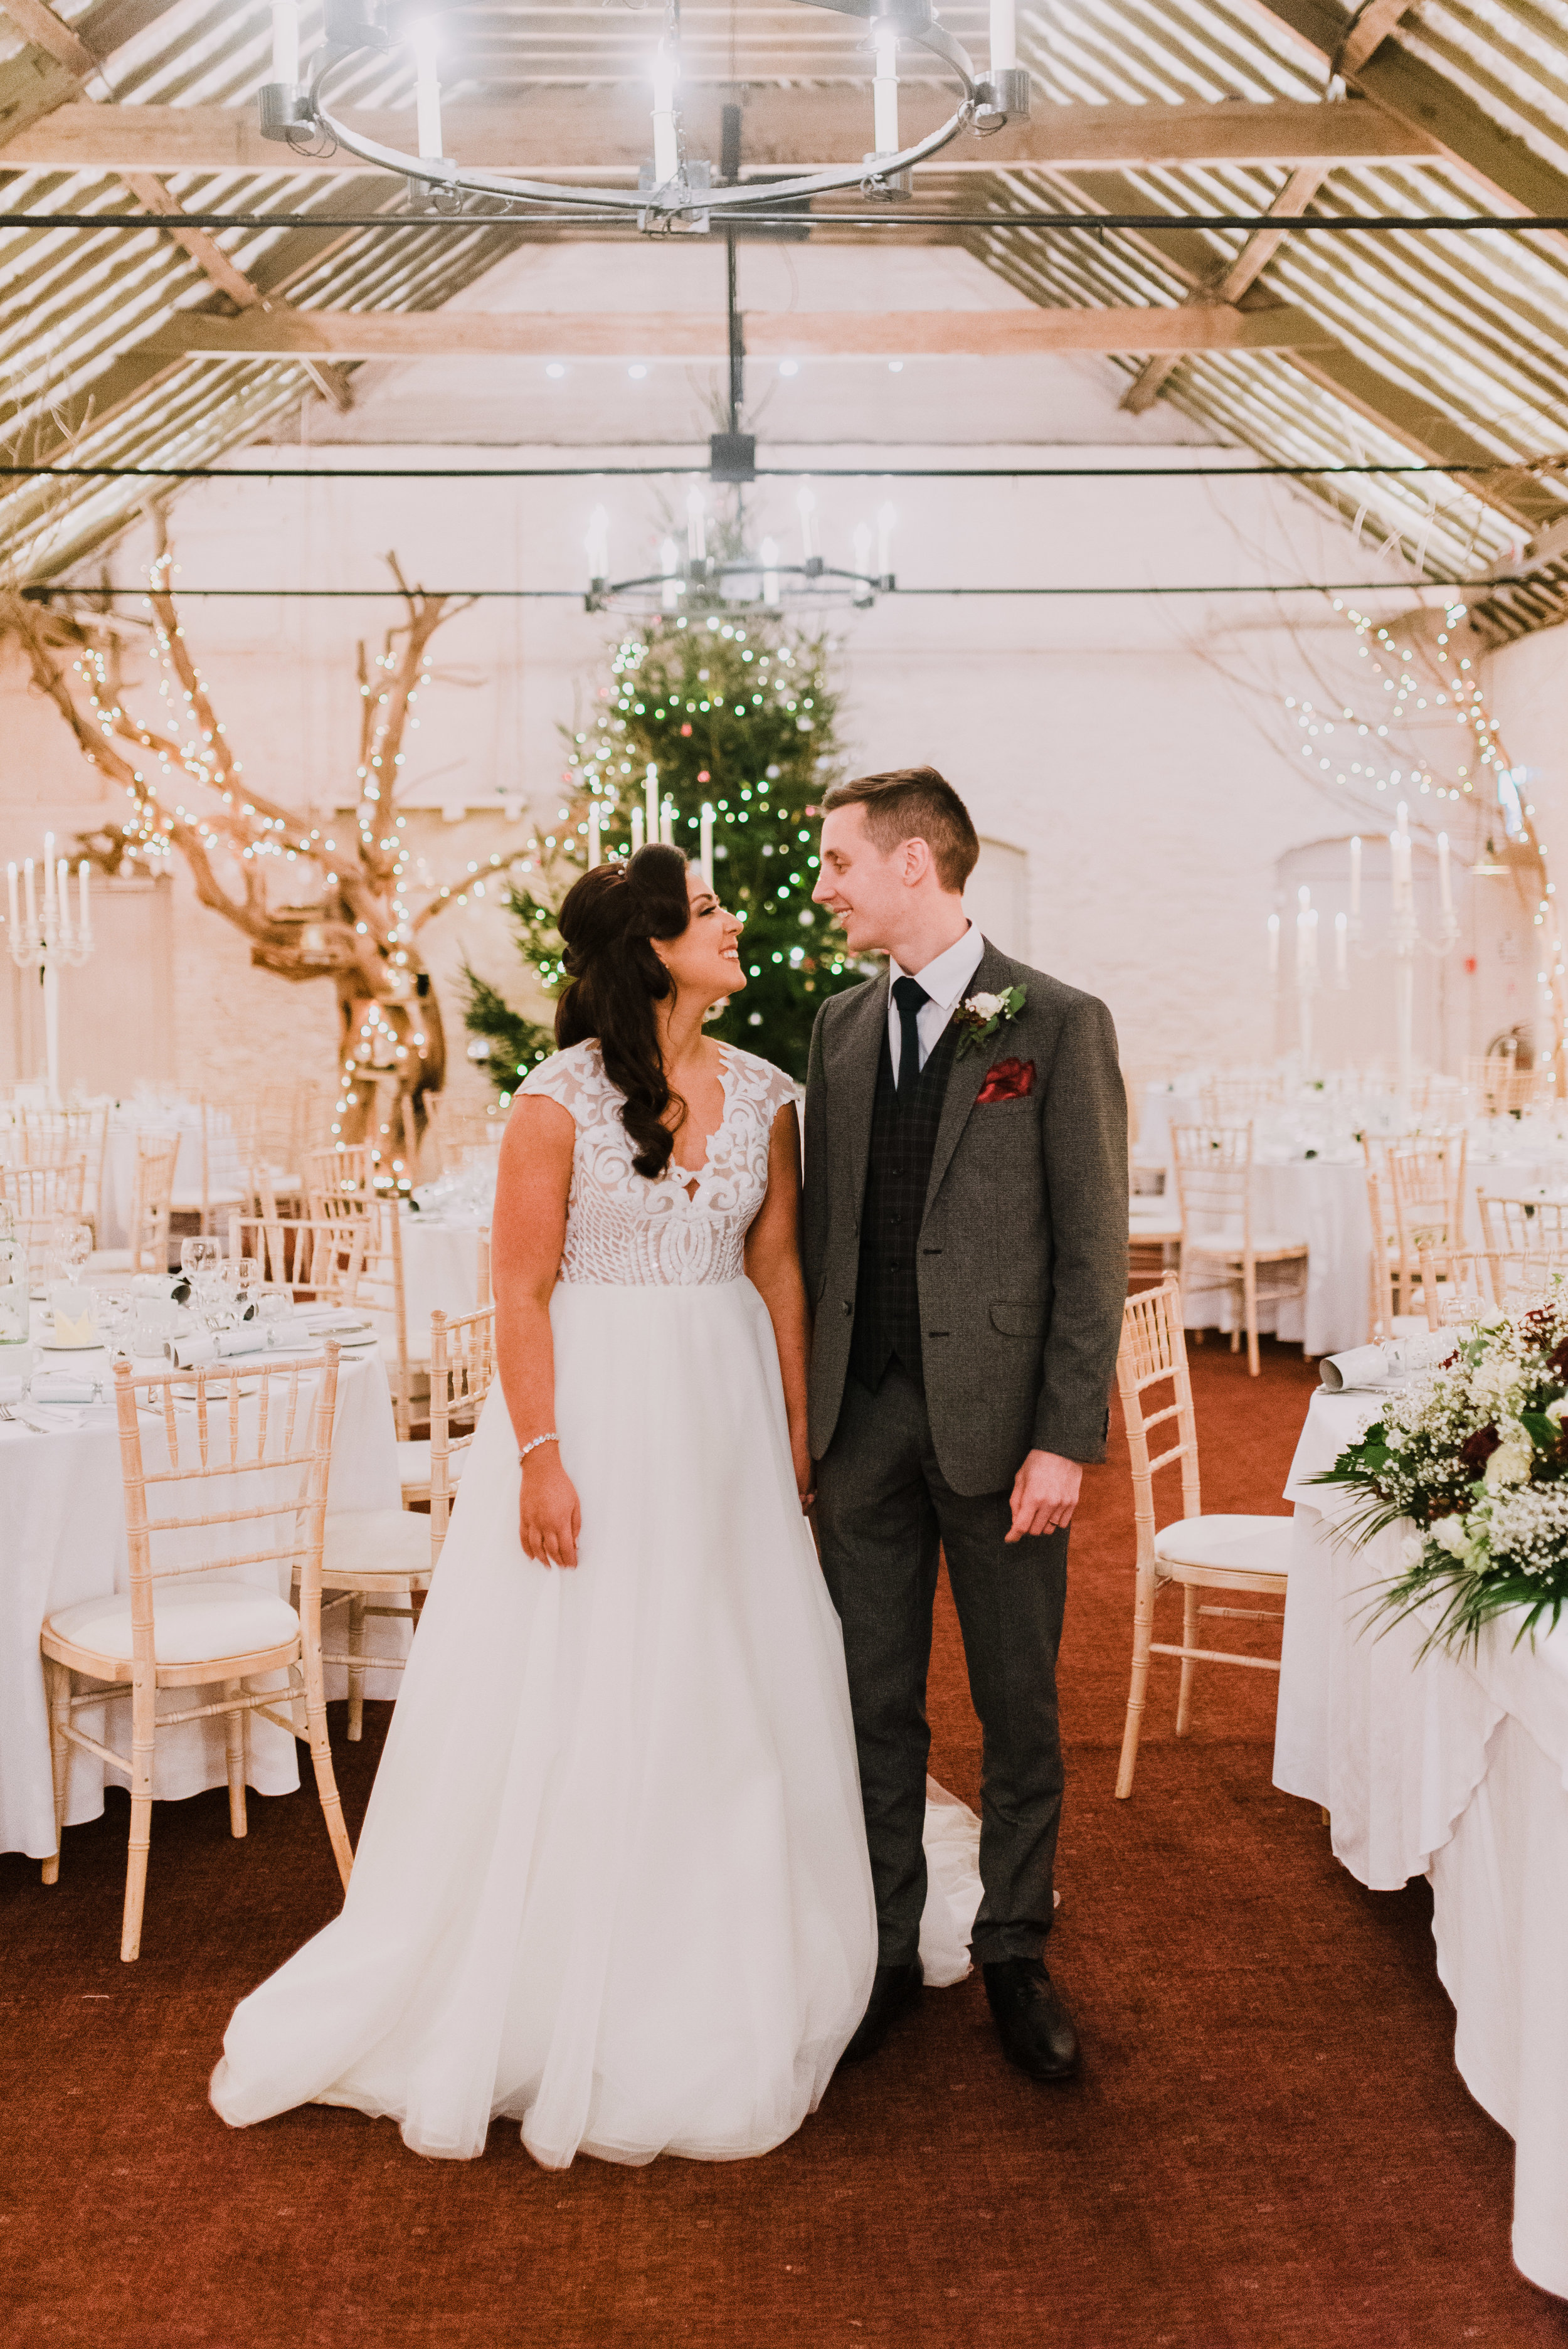 larchfield estate wedding, wedding venues northern ireland, barn wedding venues northern ireland, wedding photos larchfield estate, shane todd wedding, larchfield wedding decor ideas (5).jpg